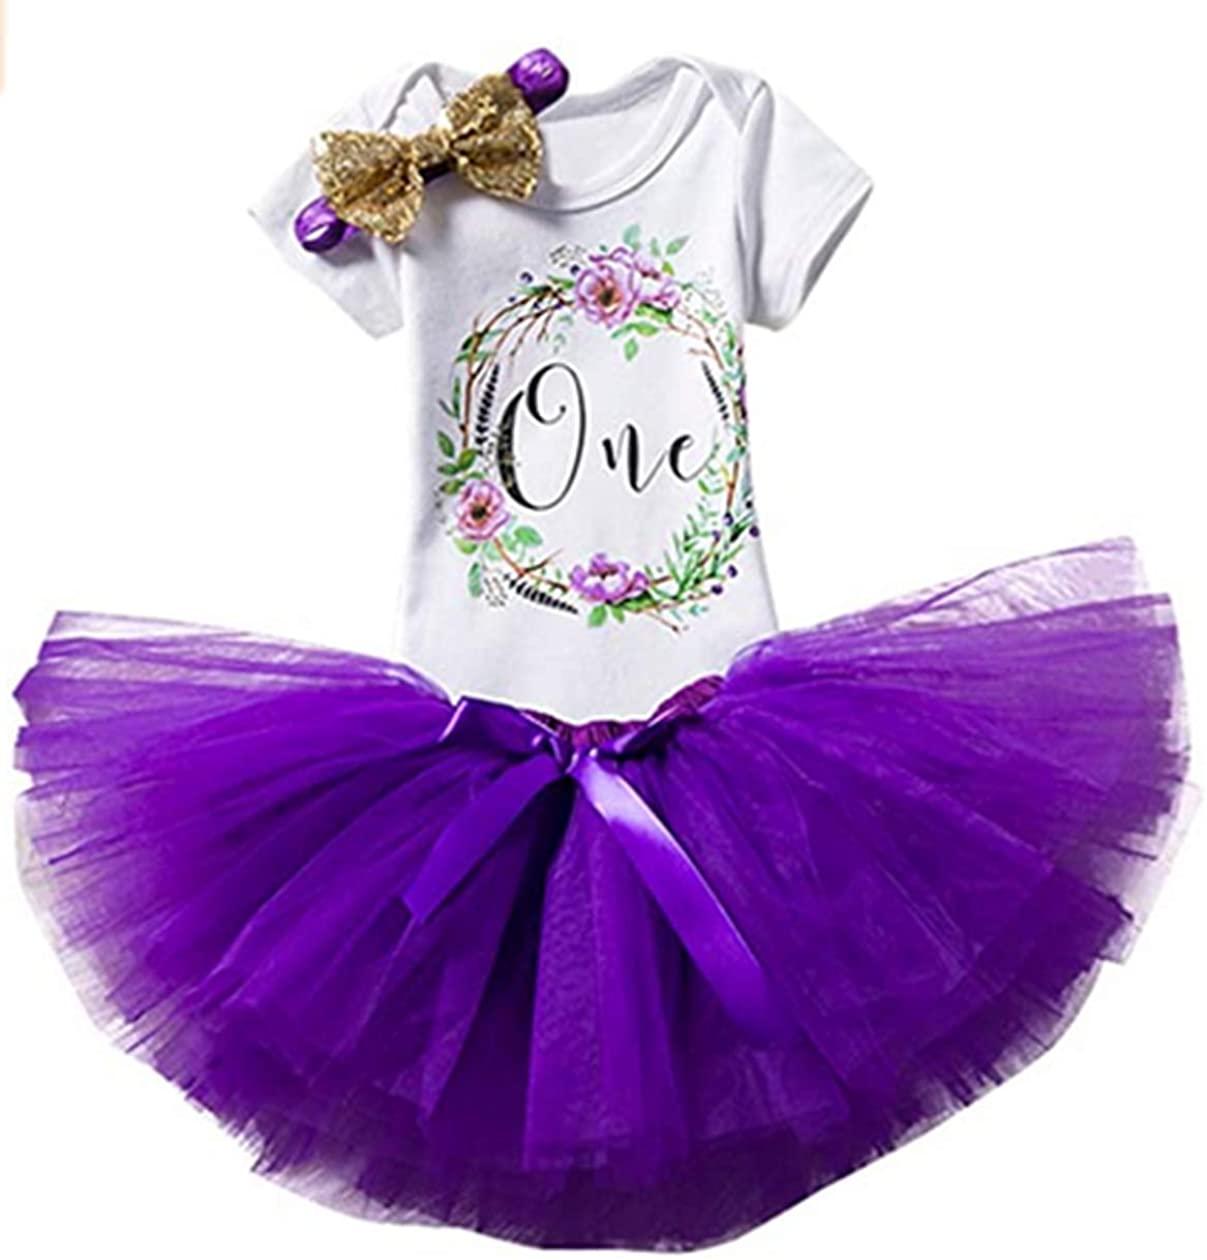 Newborn Girls 1st Birthday Outfit Ruffled Floral One Romper Tutu Skirt+Headband Dress First Birthday Girl Outfit